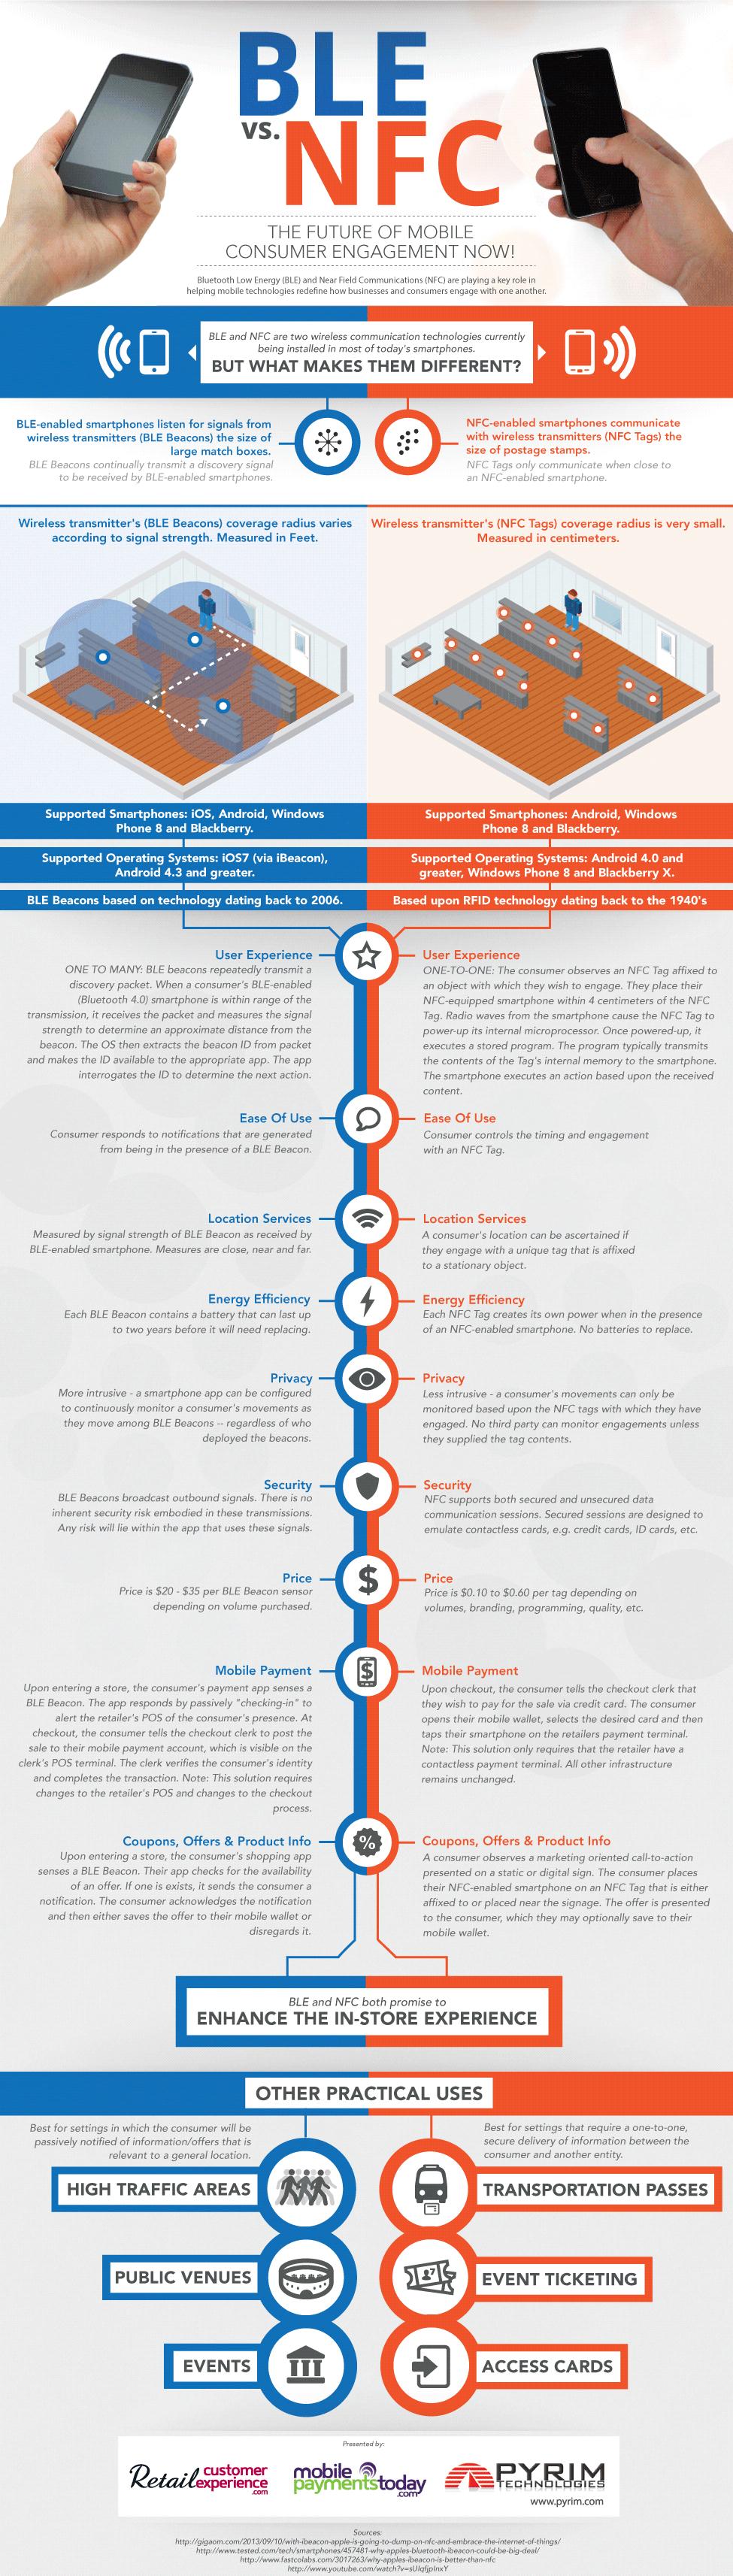 BLE-vs-NFC-infographic[1]